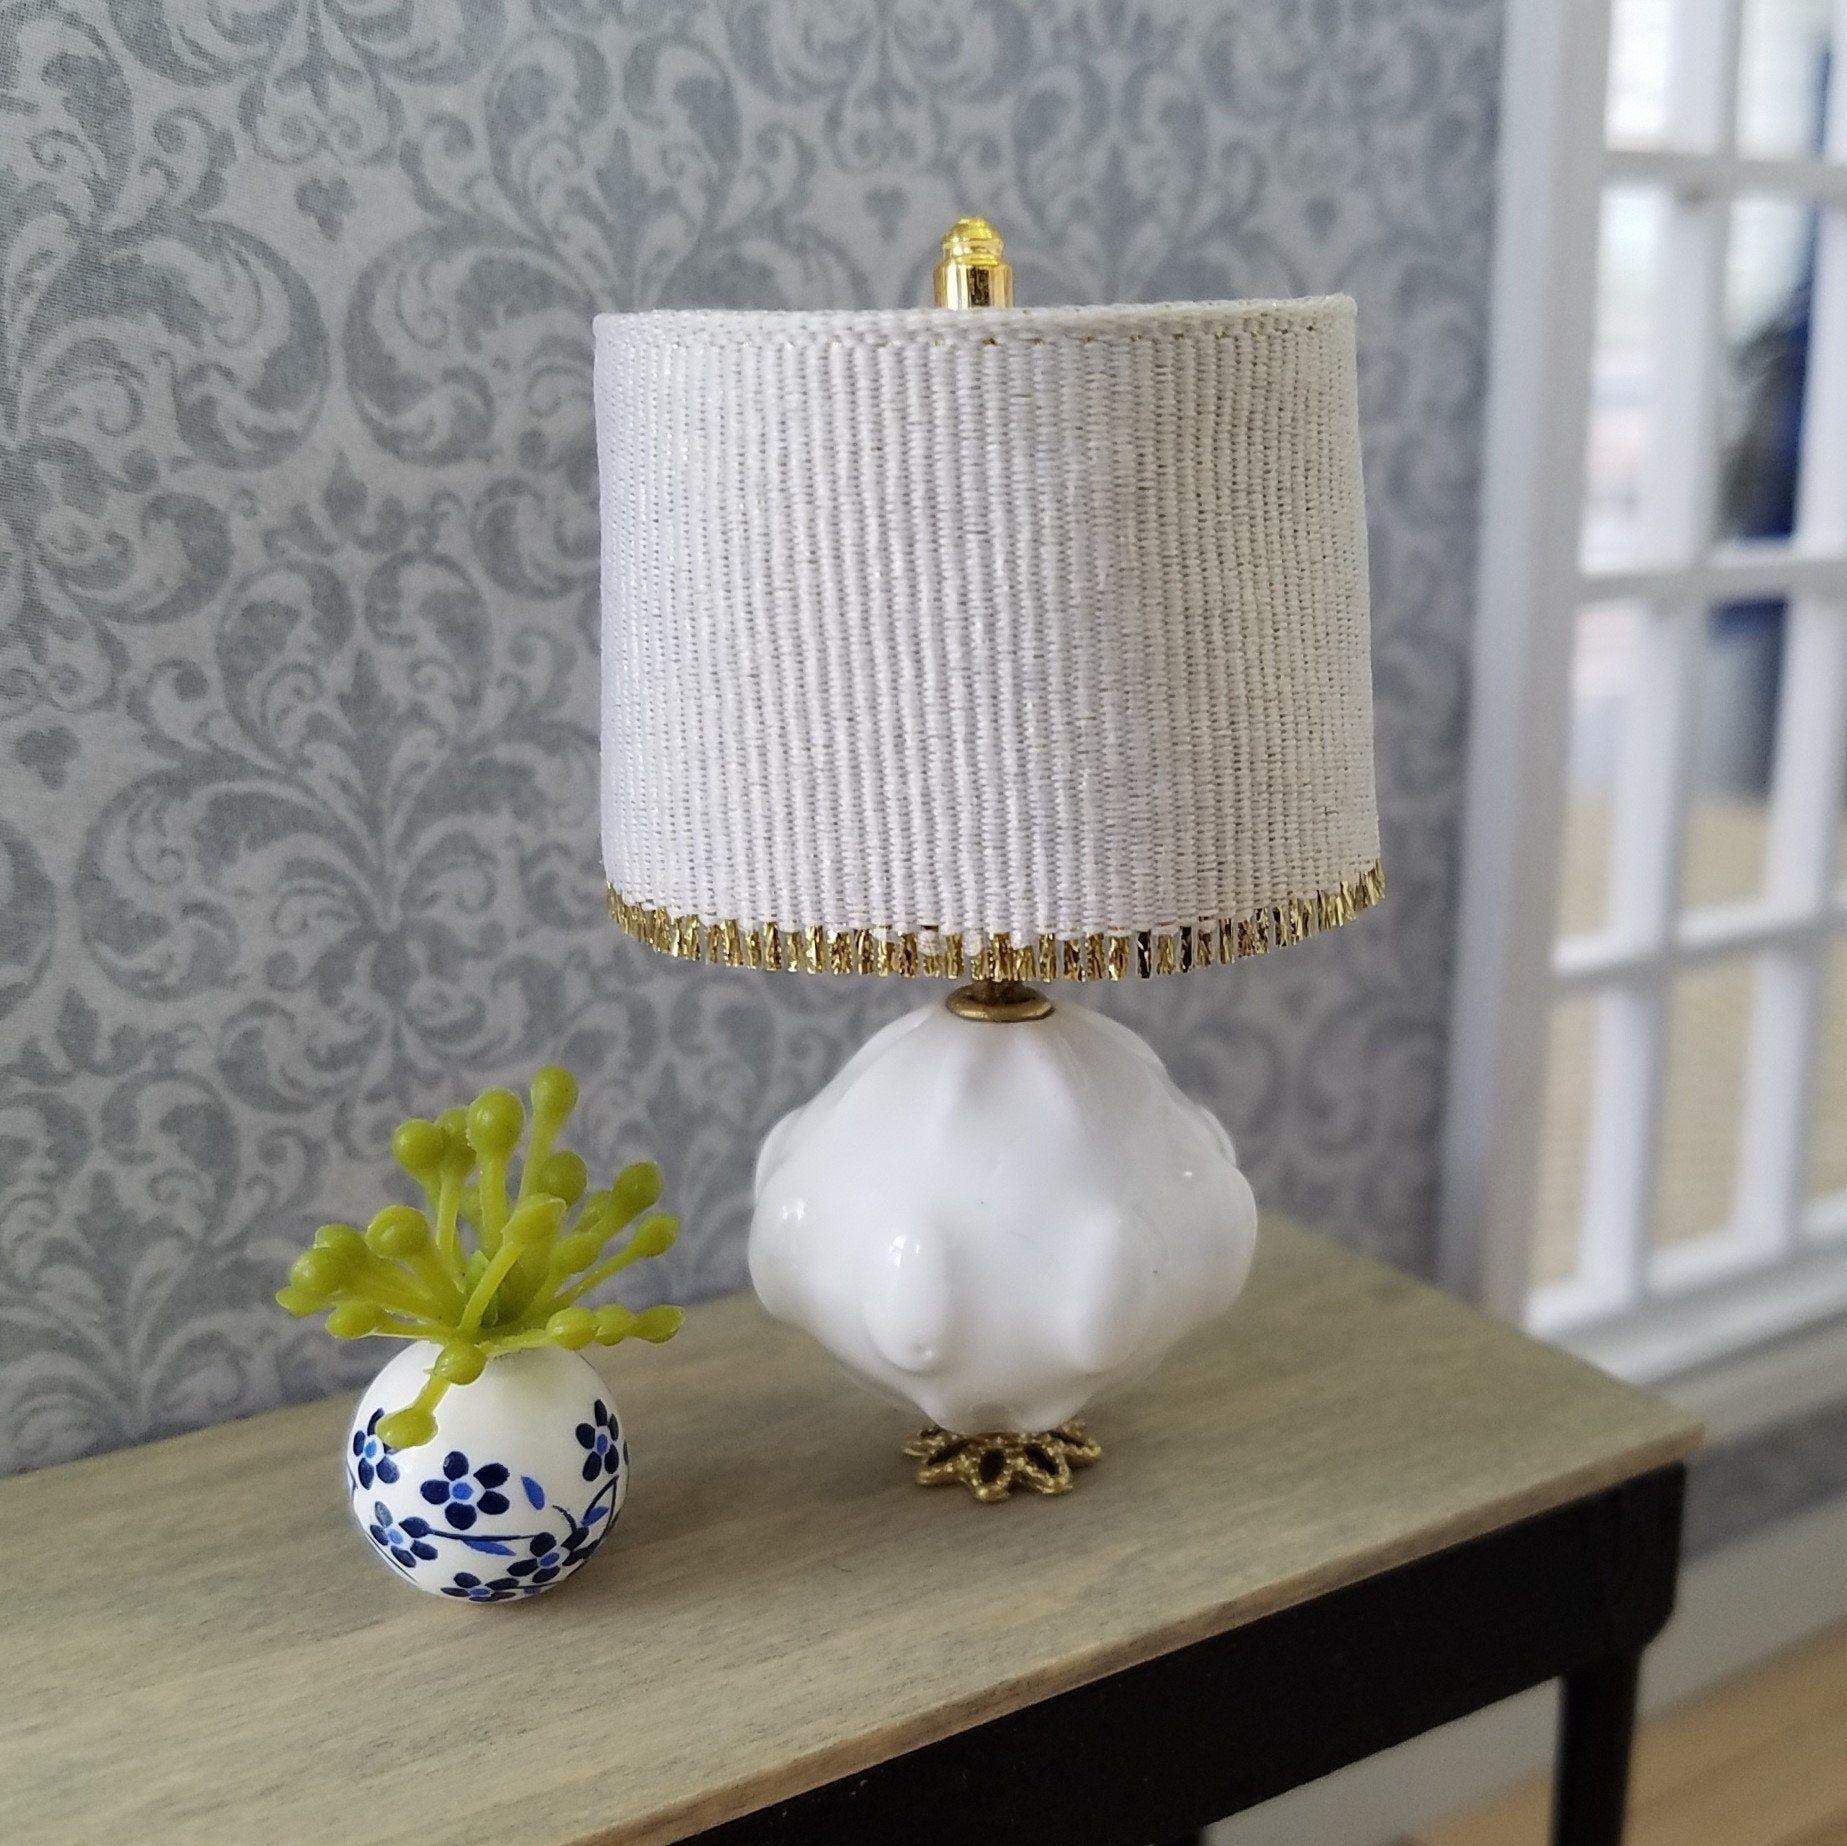 Miniature Lamp Dollhouse Lamp Table Lamp Home Decor White